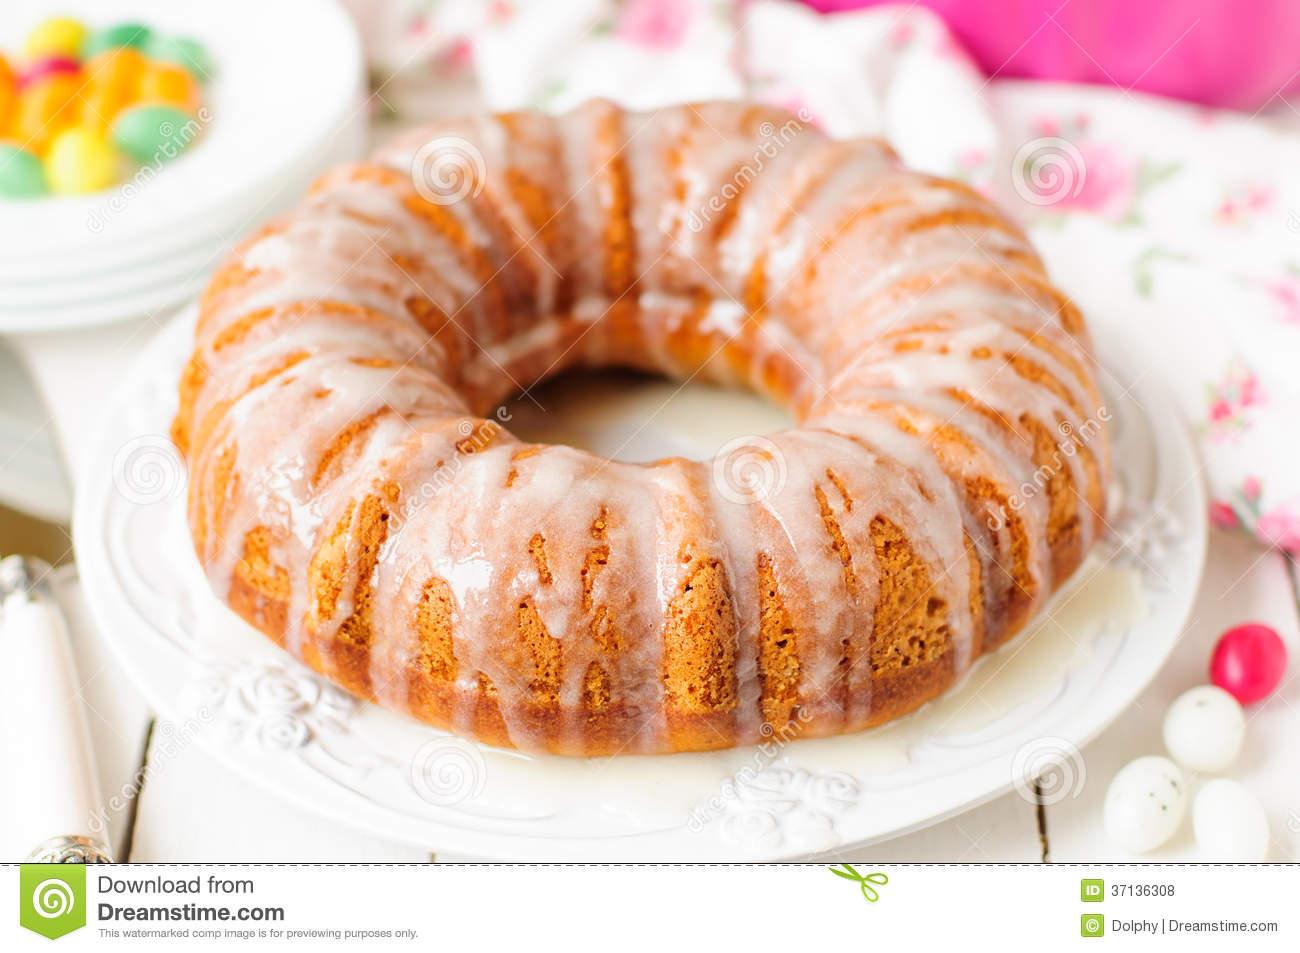 Pumpkin Bundt Cake with Icing